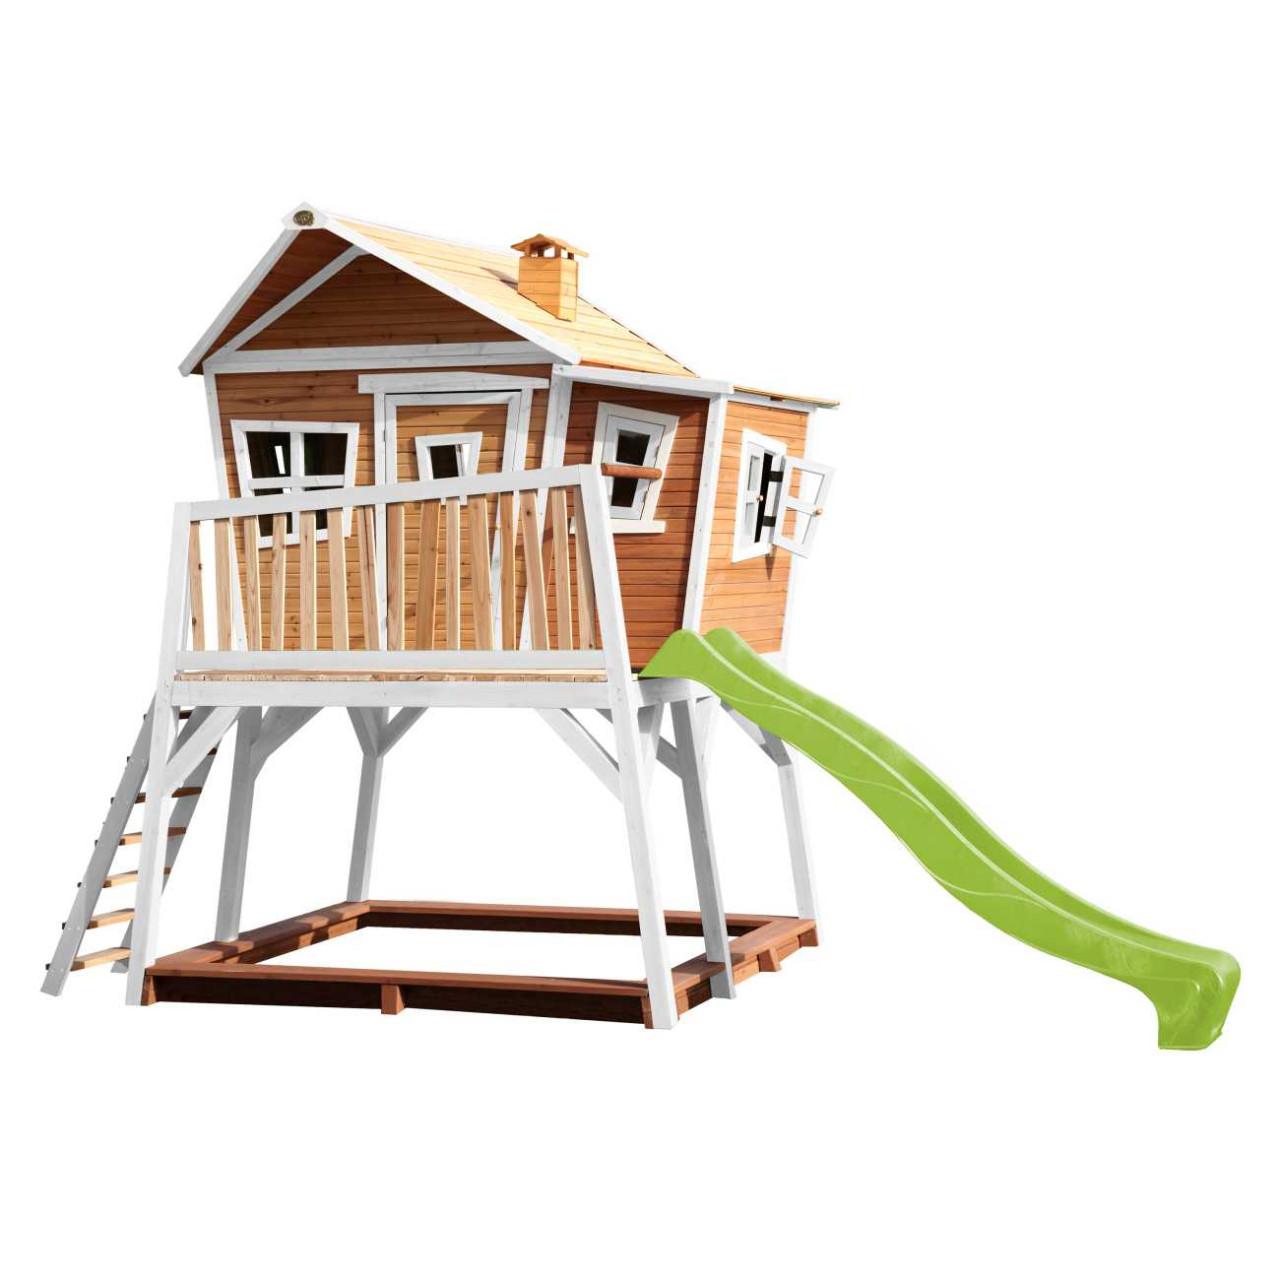 Axi Stelzenhaus Max, Kinder Spielhaus